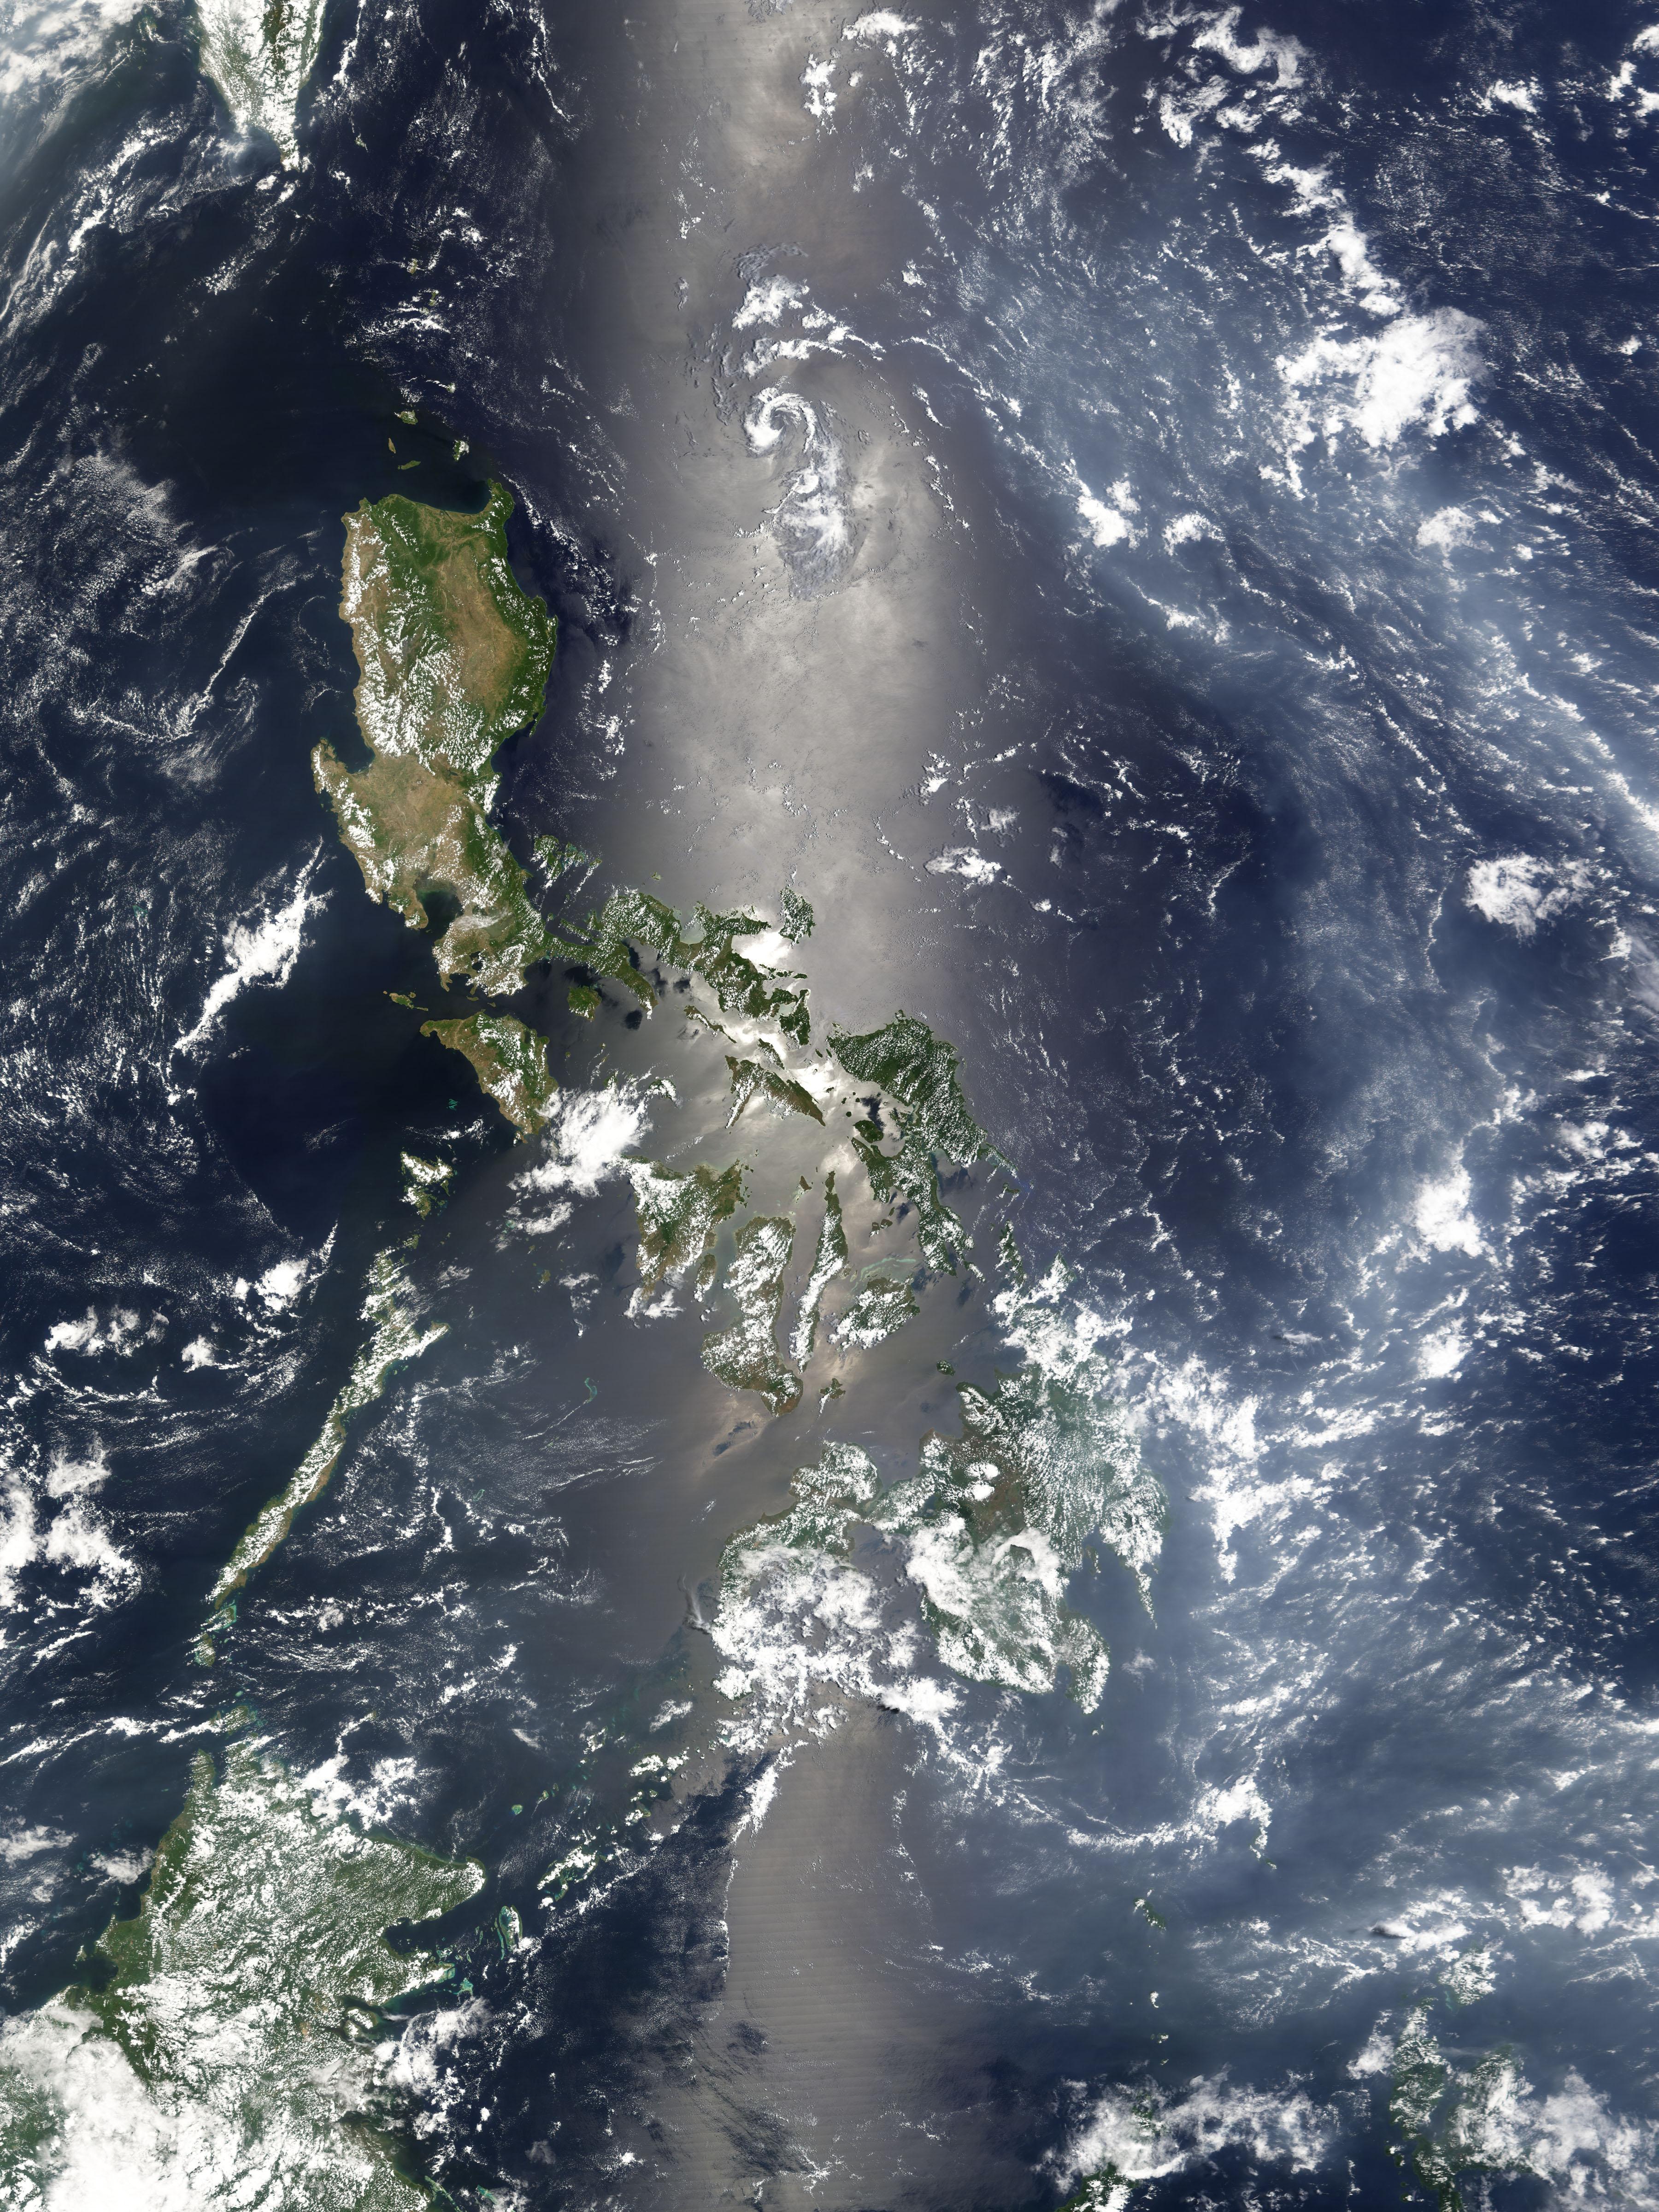 Haze over the Philippine Sea : Natural Hazards